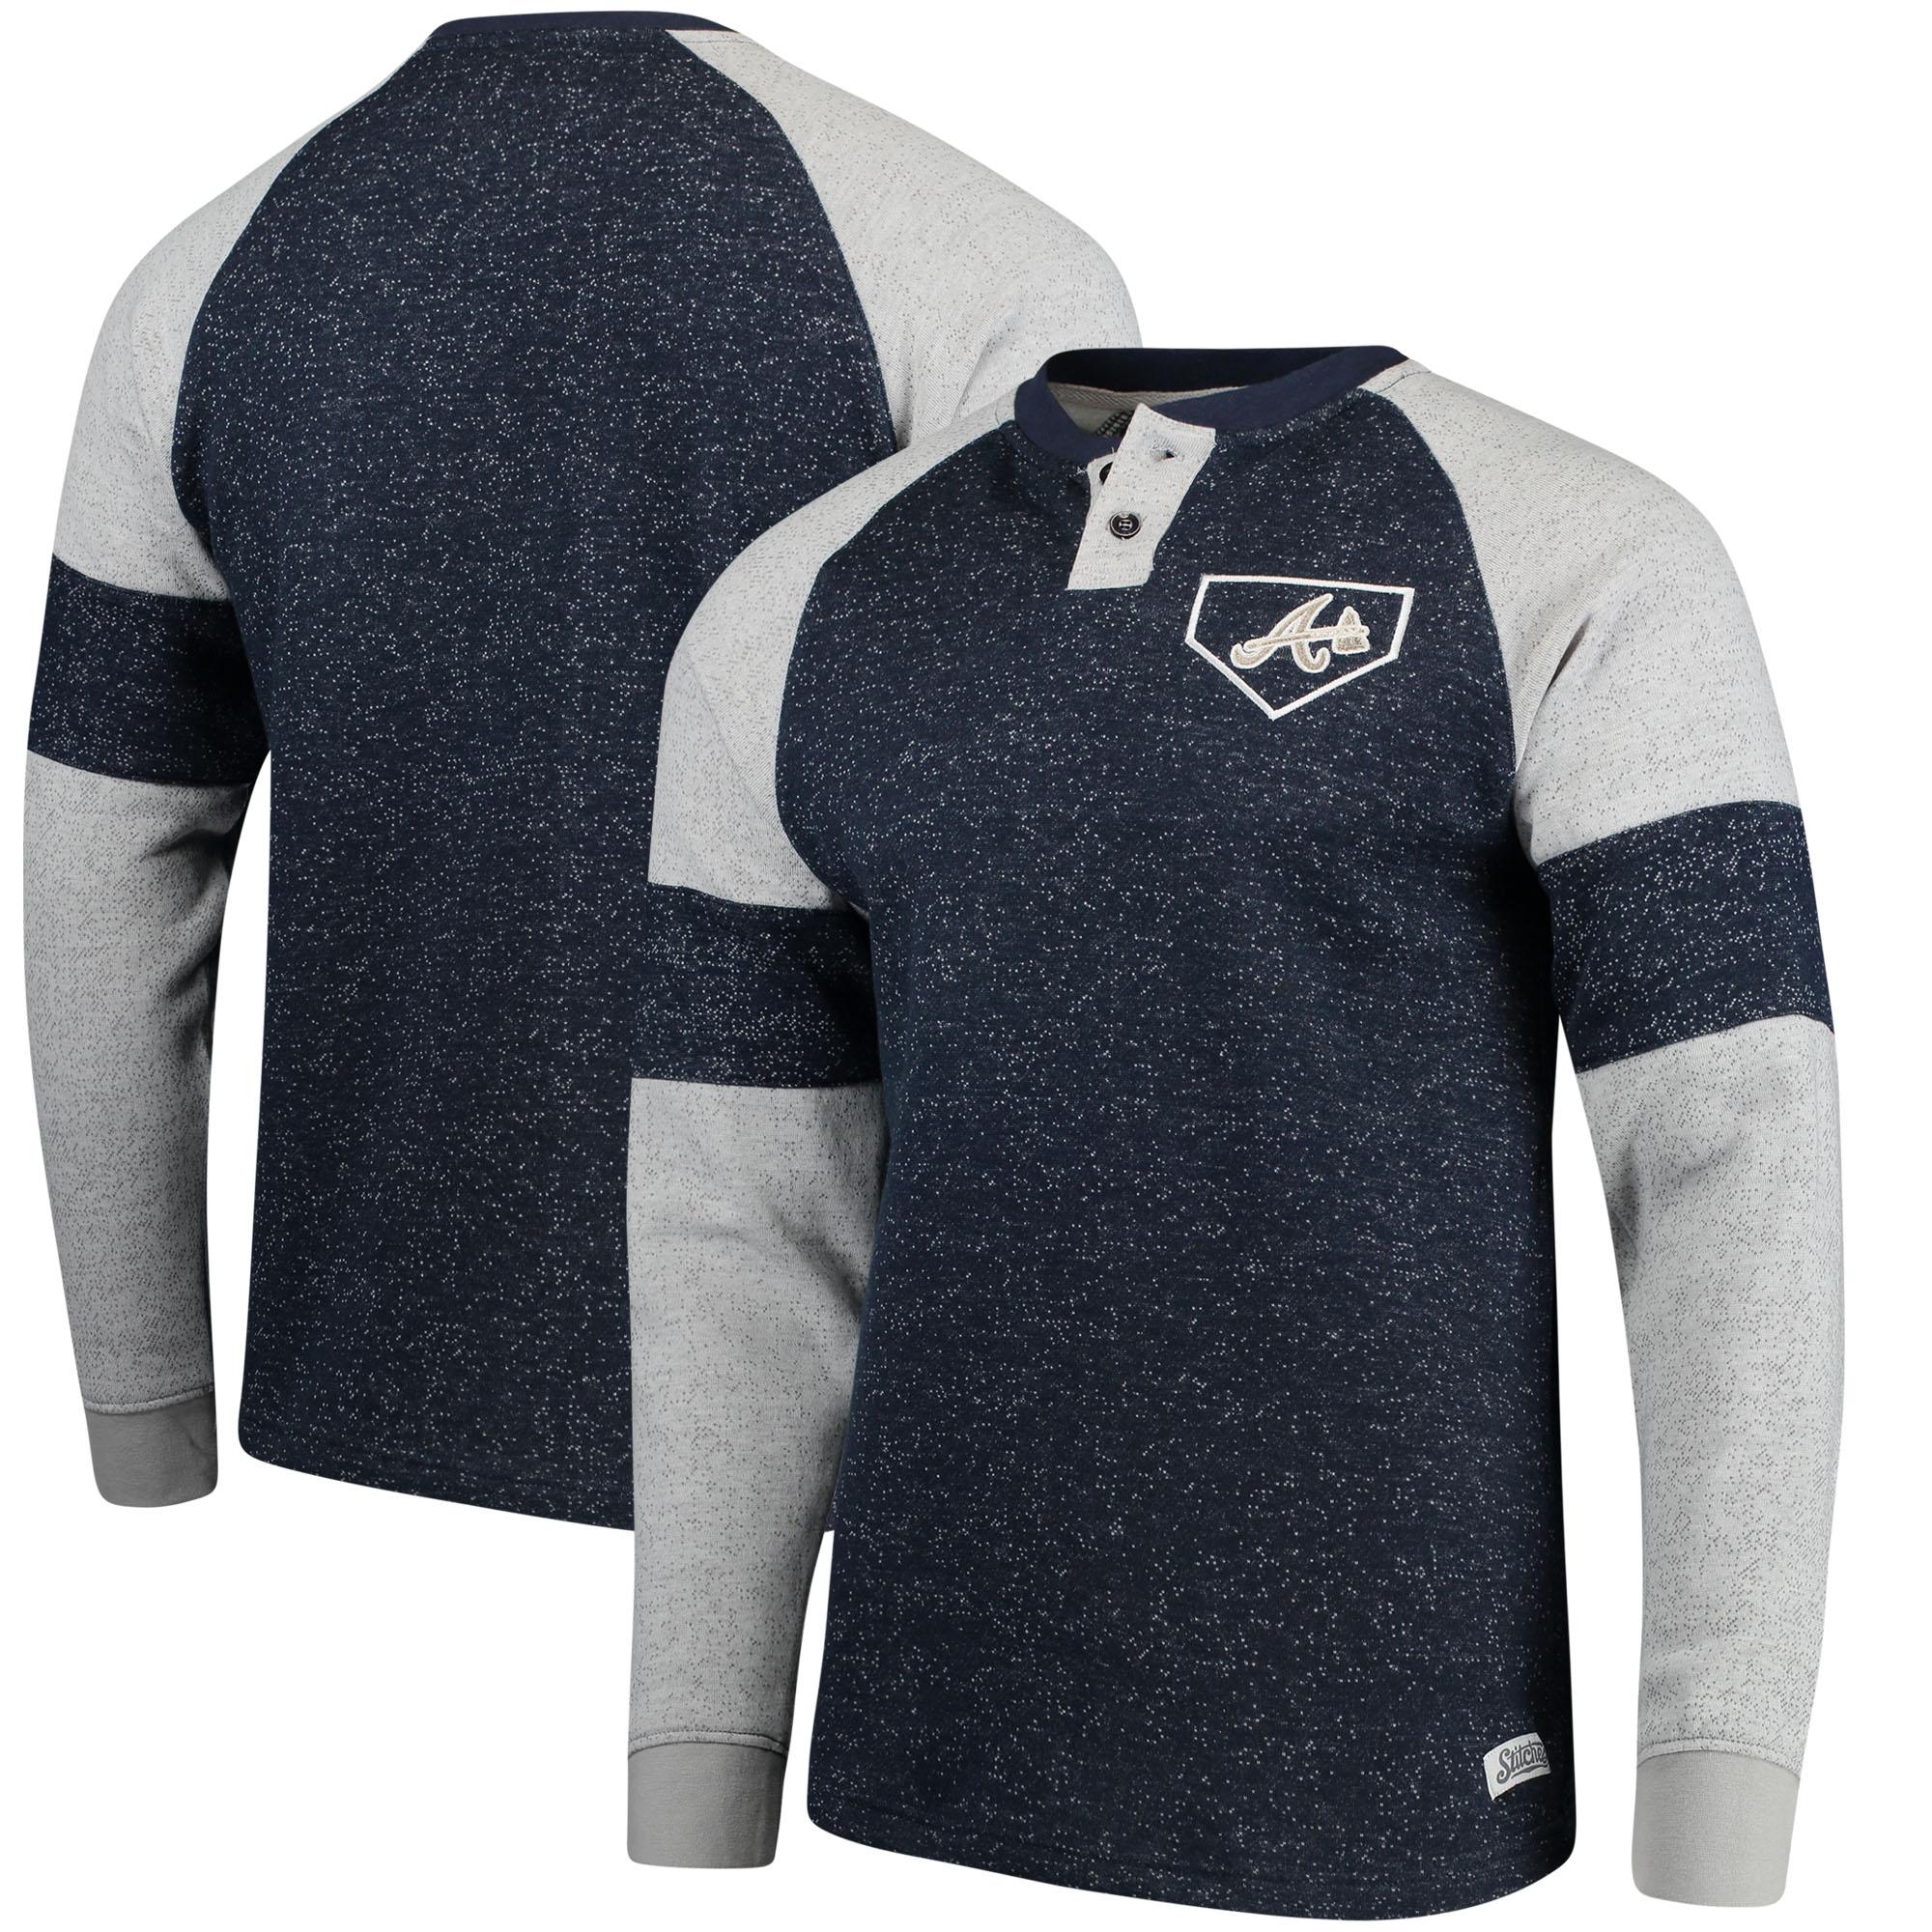 Atlanta Braves Stitches Twisted Yarn Henley Long Sleeve T-Shirt - Navy